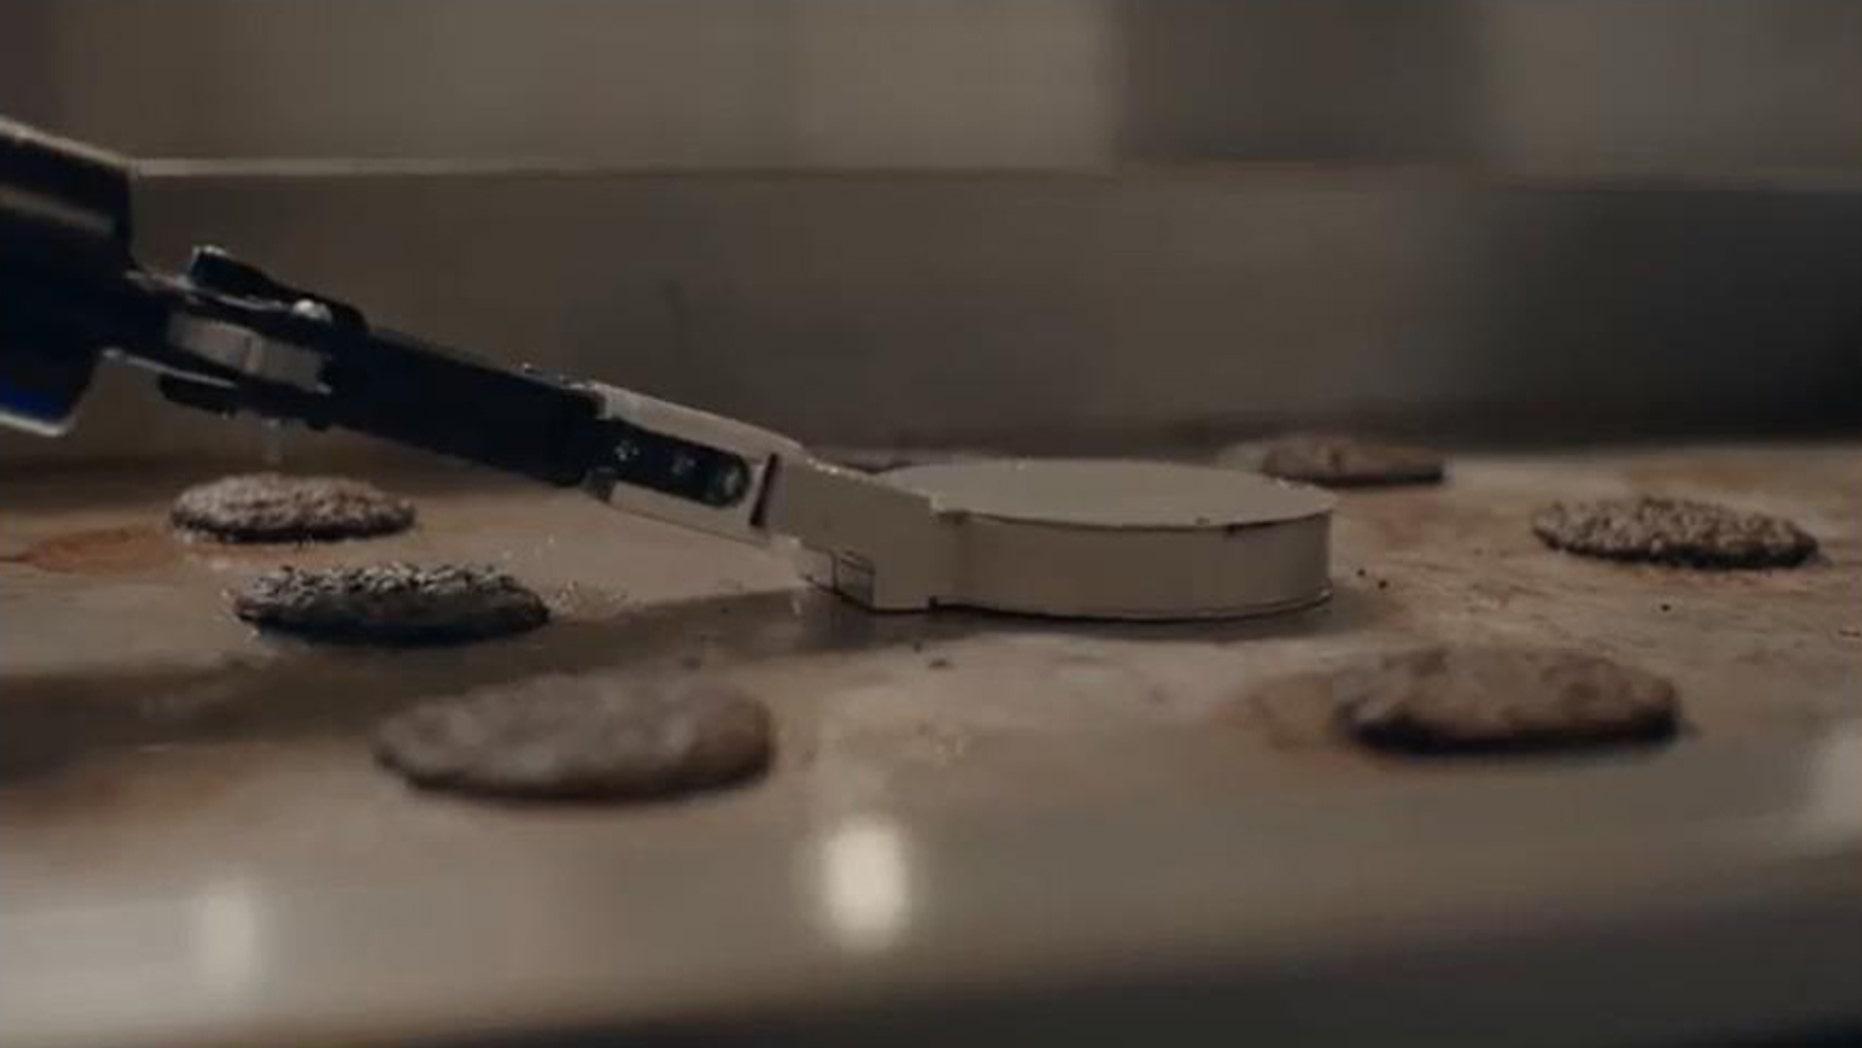 (Screenshot from Miso Robotics YouTube video).